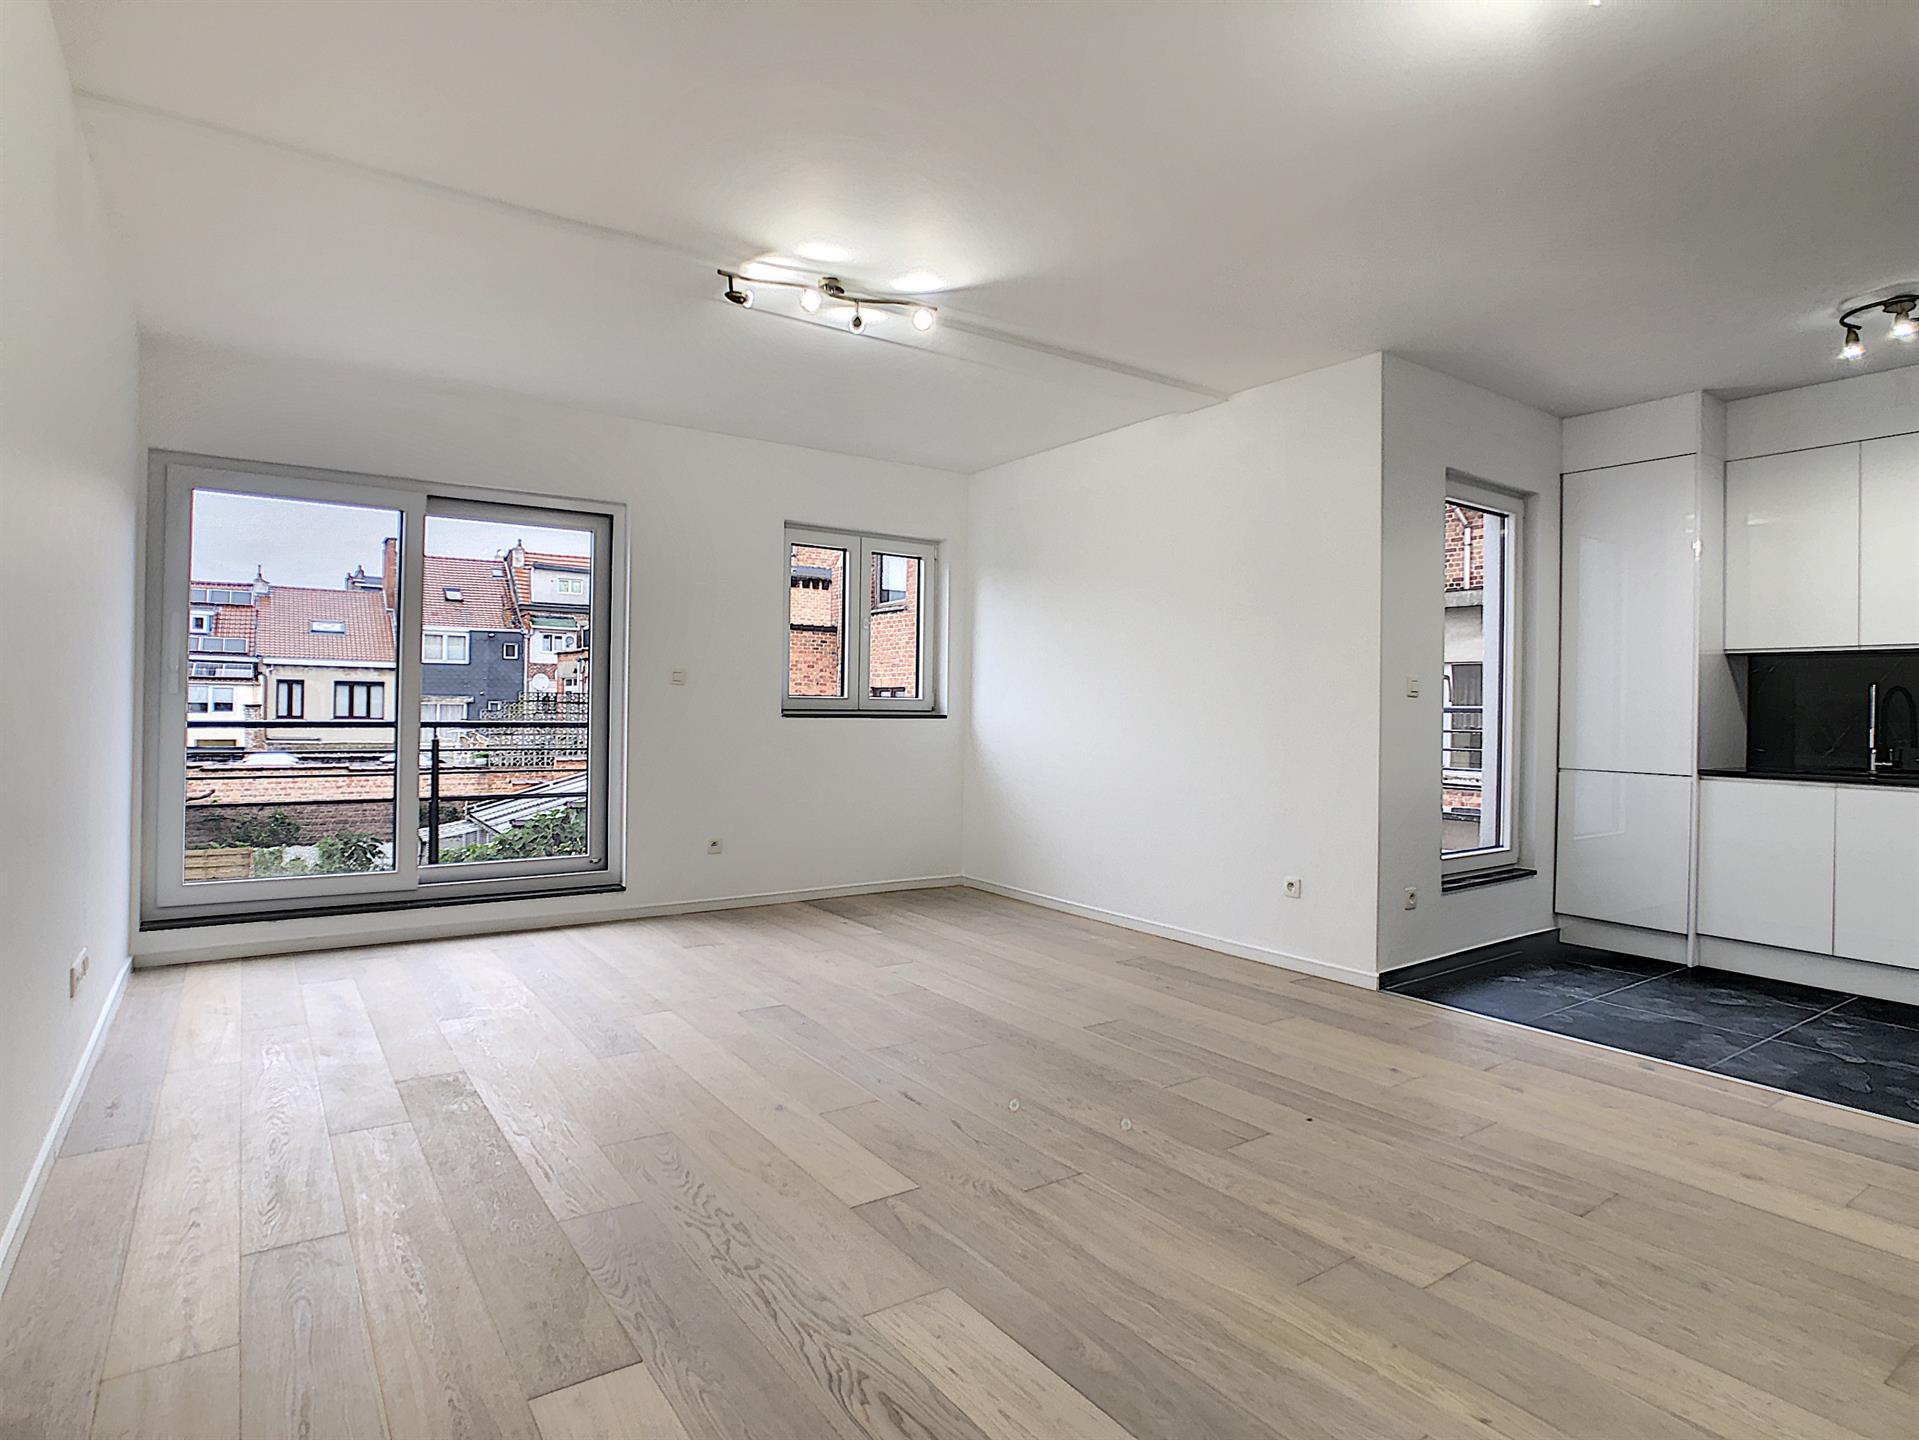 Appartement - Anderlecht - #4252376-44